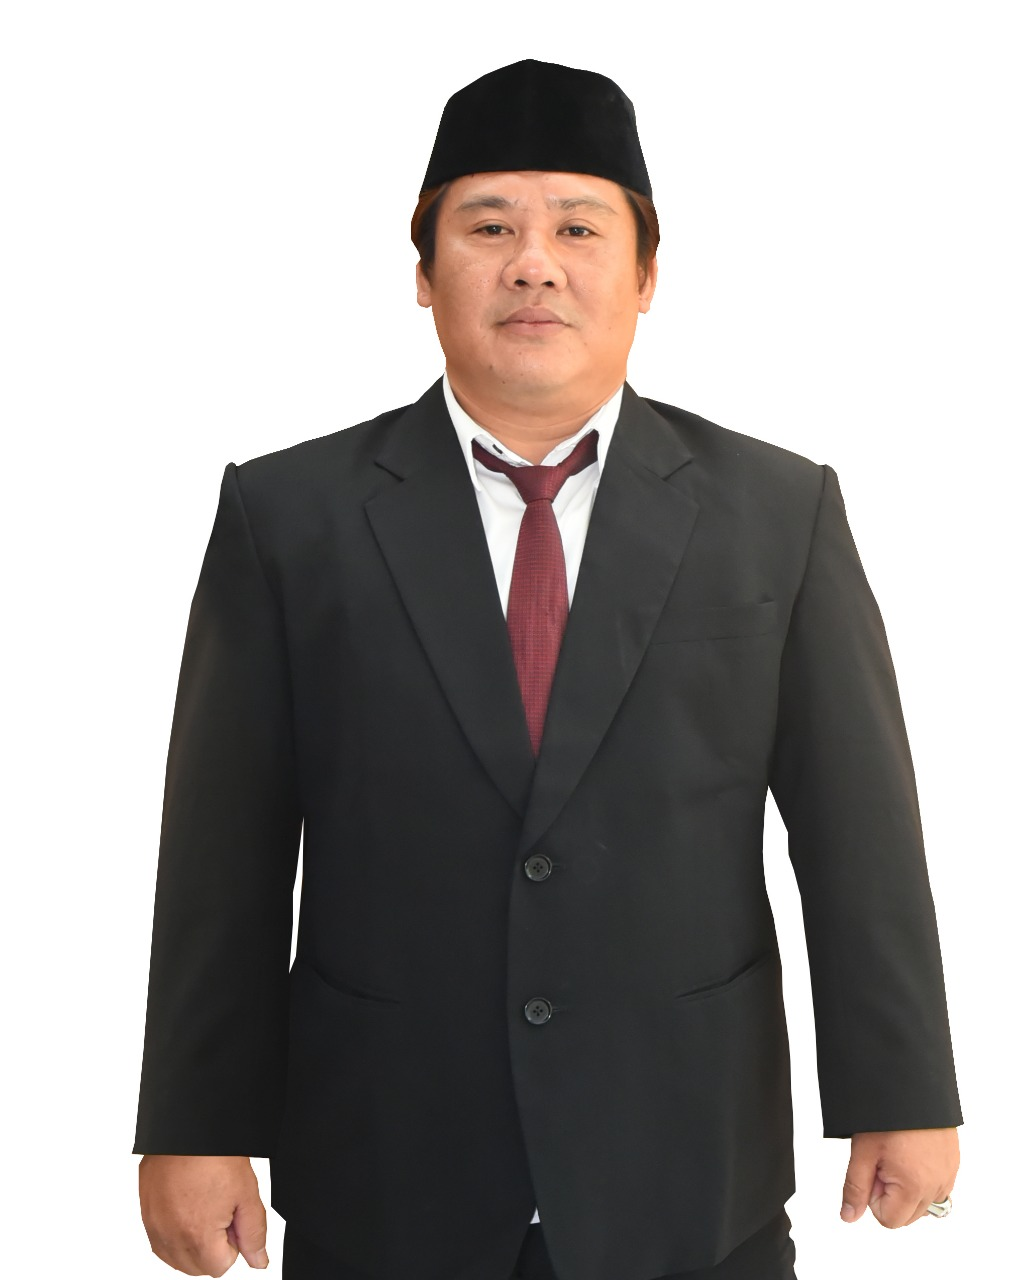 Cipto Waluyo Ditahan KPK, Agung Prabowo Ditunjuk jadi Ketua Sementara DPRD Kebumen